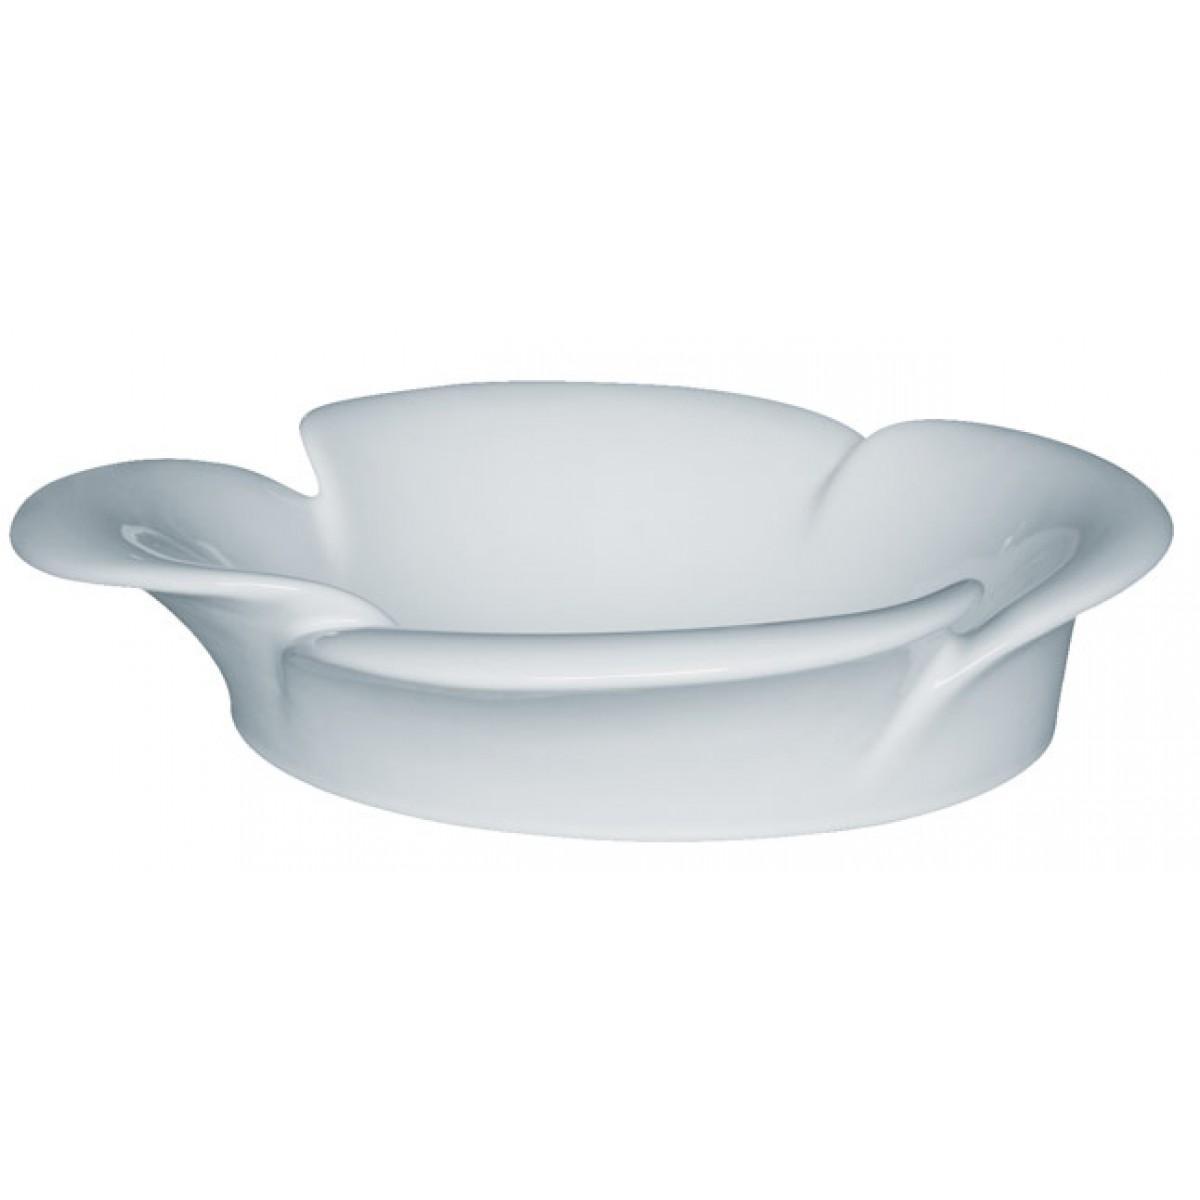 Flower Vessel Sink : Flower Porcelain Ceramic Countertop Bathroom Vessel Sink - 20-1/2 x 8 ...